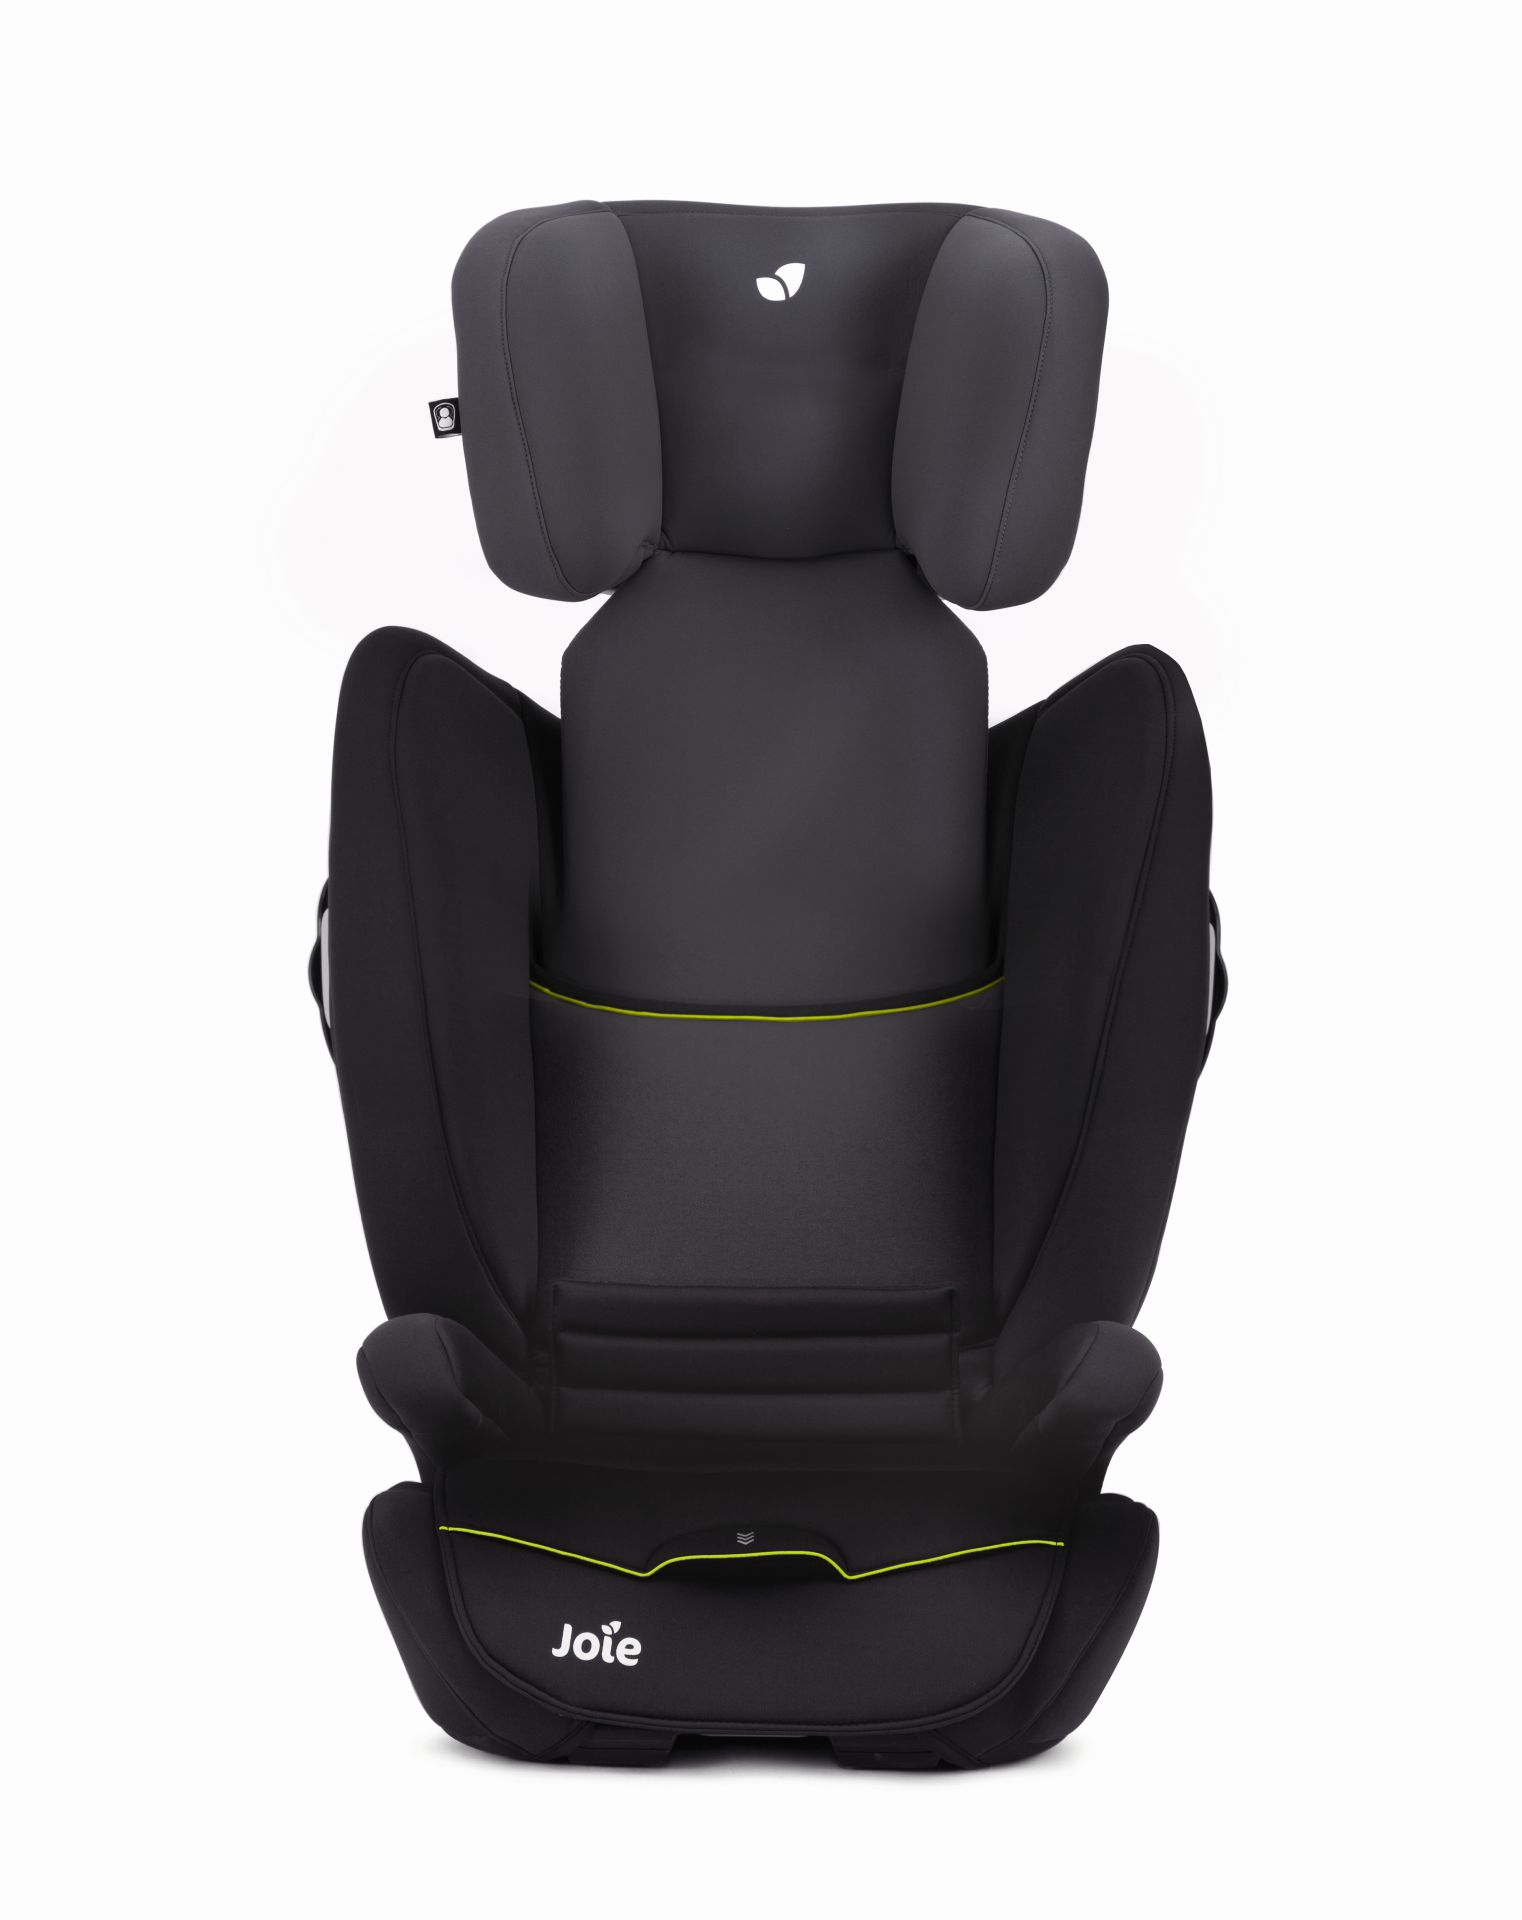 joie car seat duallo 2017 urban buy at kidsroom car seats. Black Bedroom Furniture Sets. Home Design Ideas